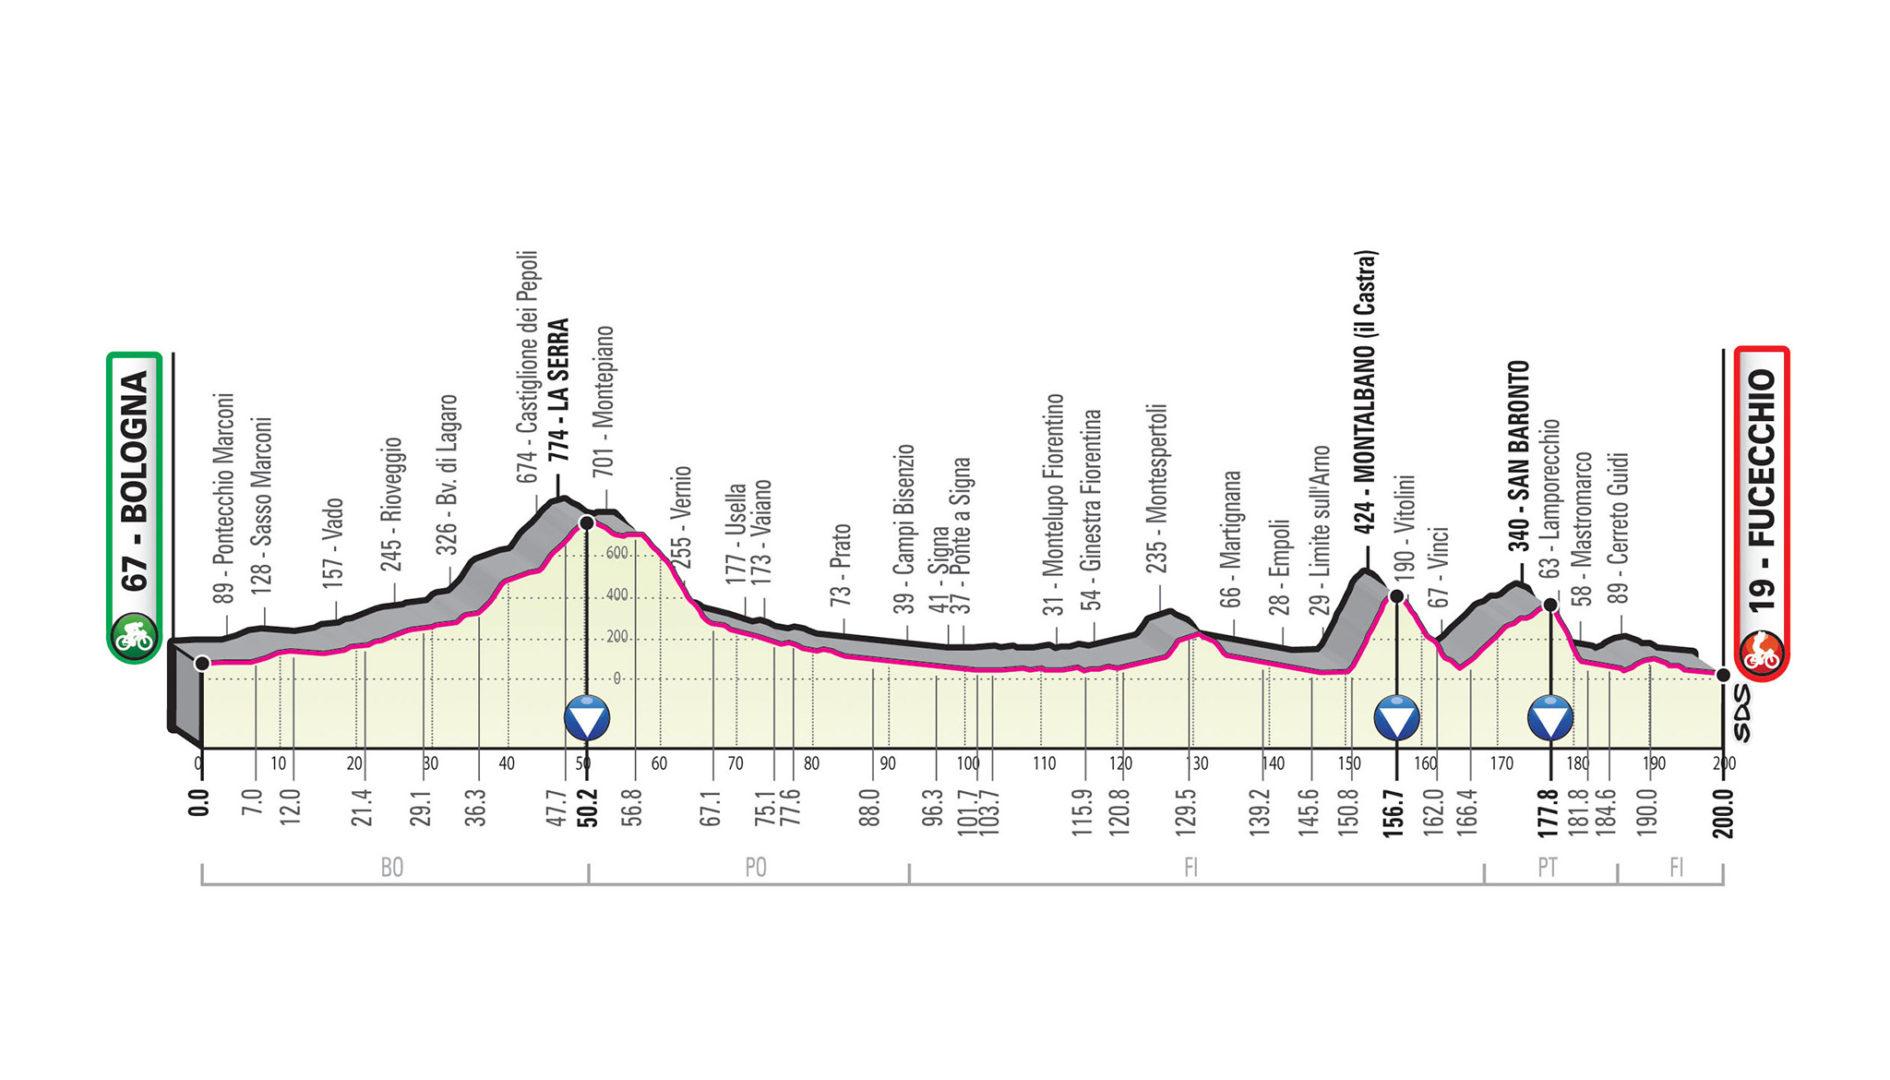 Bolonia – Fucecchio. 200 kms.